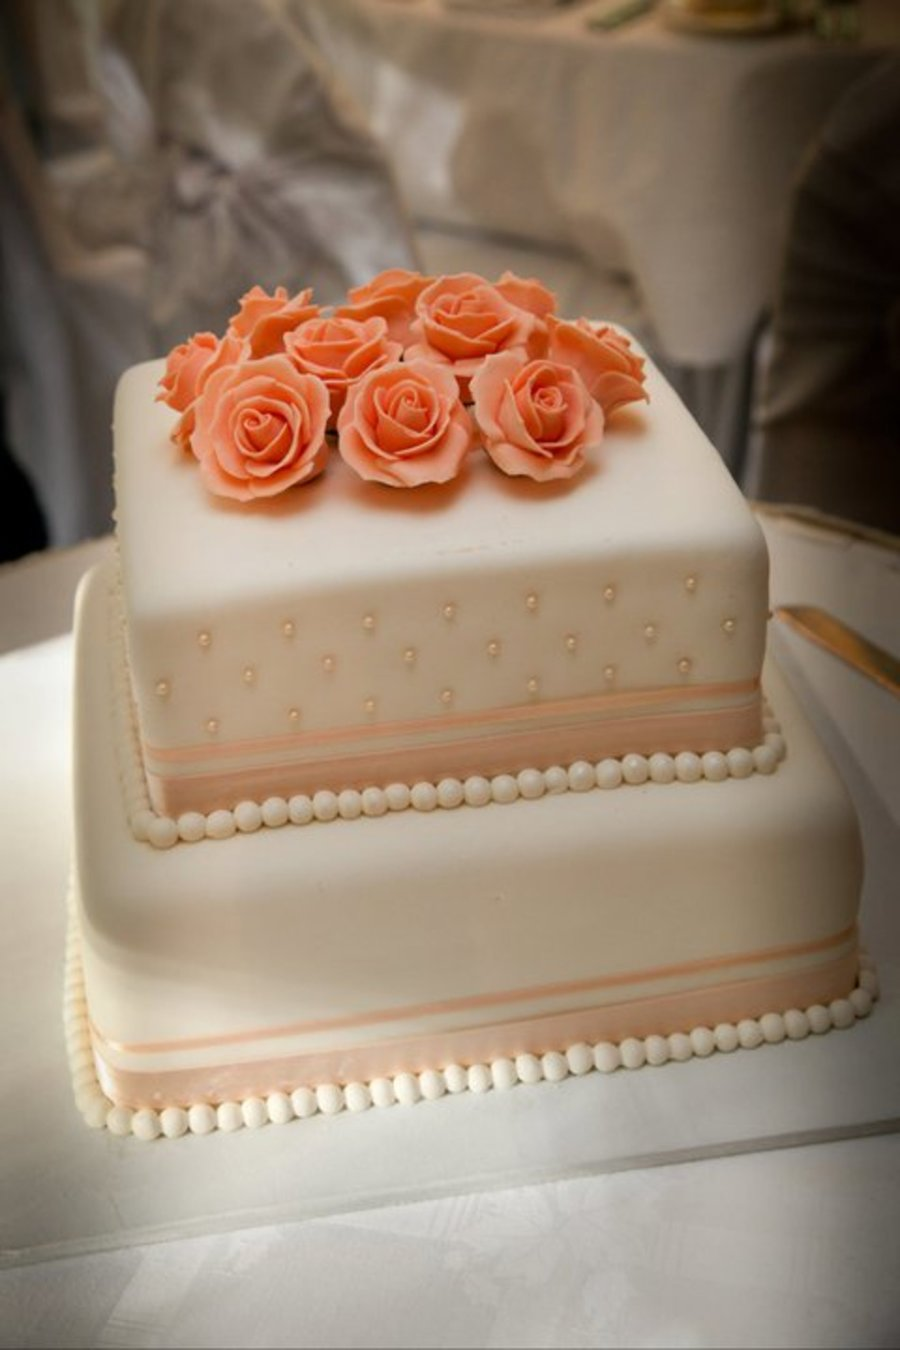 Peach Cream Filling For Cake